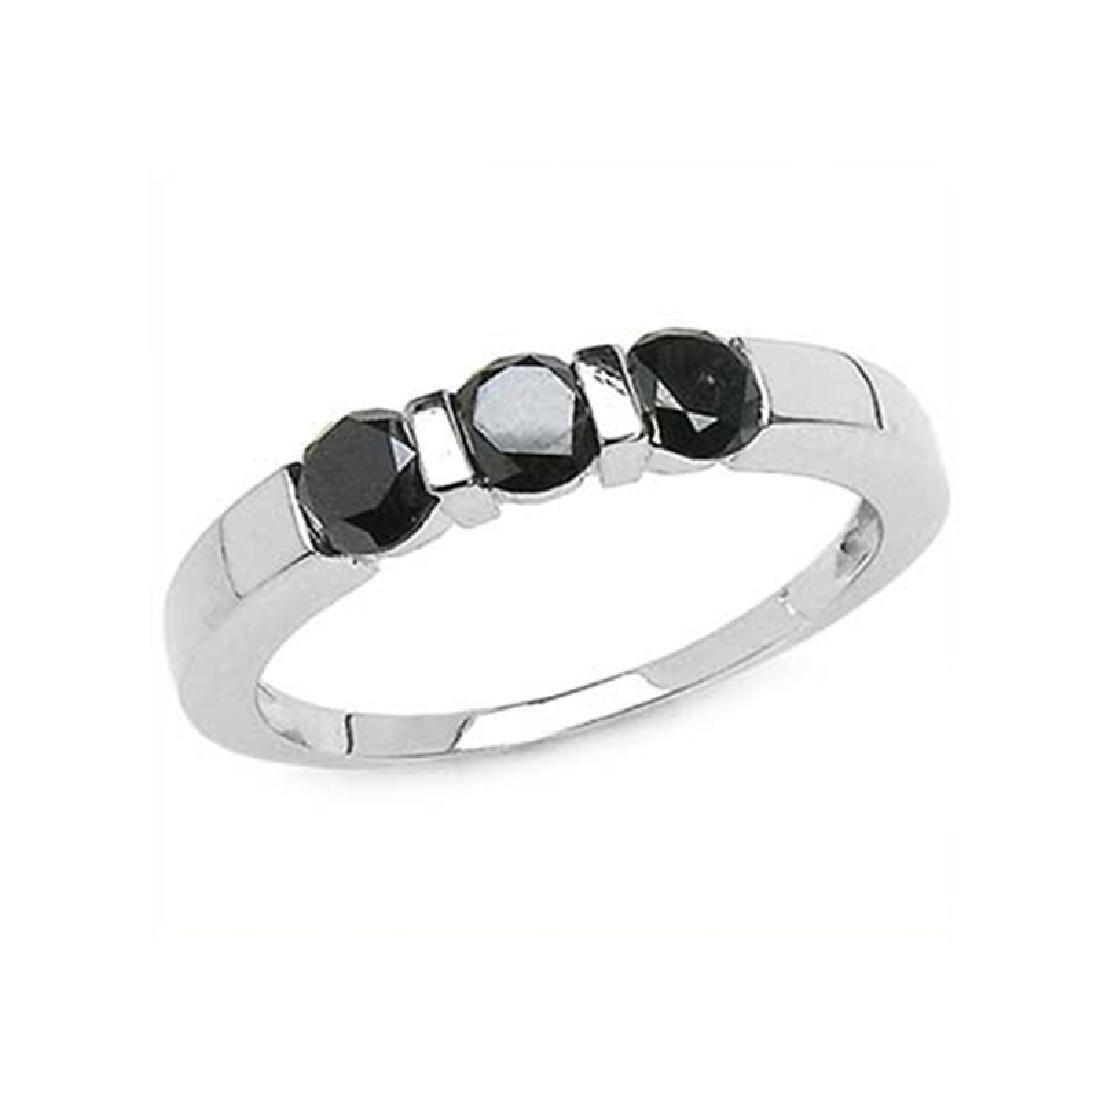 *Fine Jewelry 1.24CT Round Cut Black Diamond And